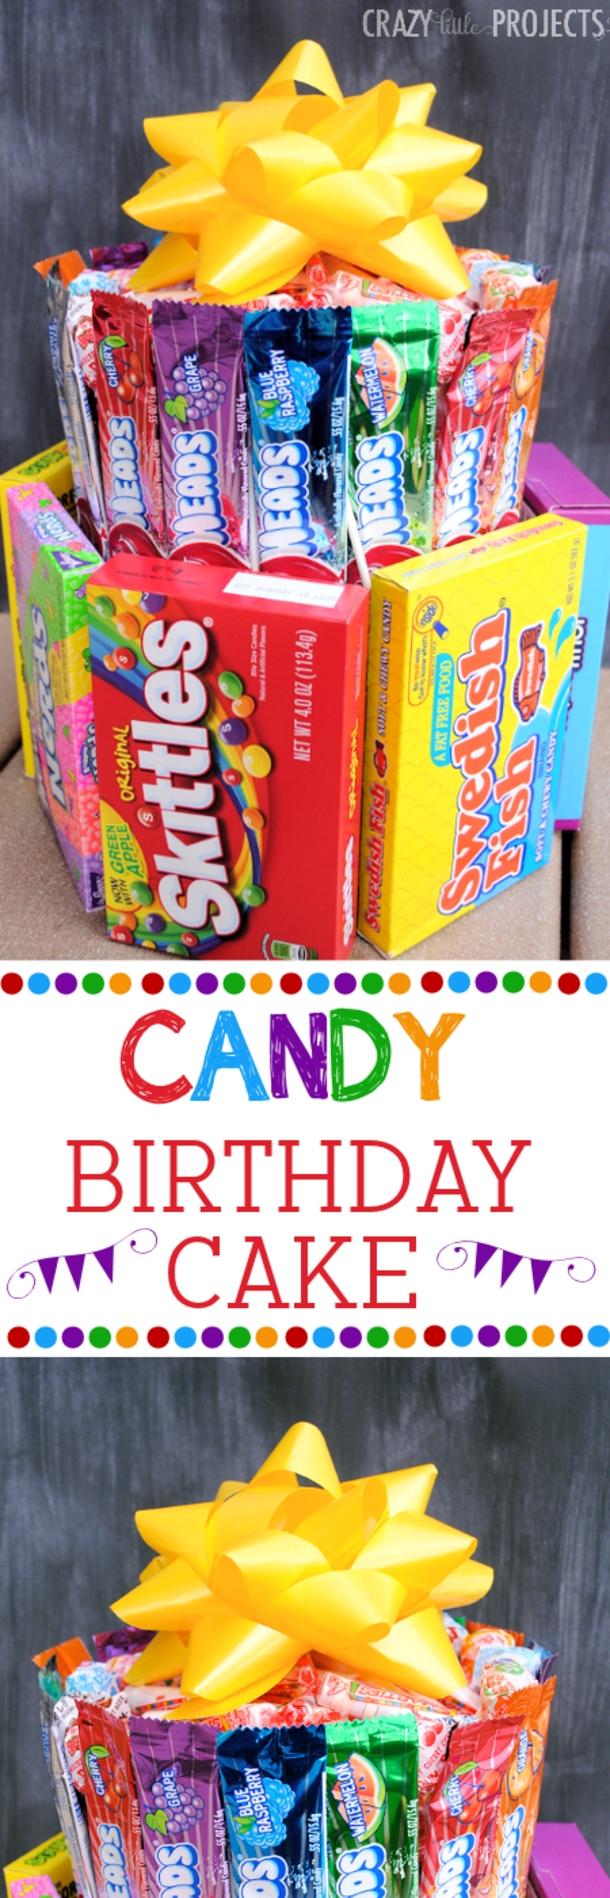 10 Pretty Sweet 16 Birthday Gift Ideas Diy Gifts For A Girls